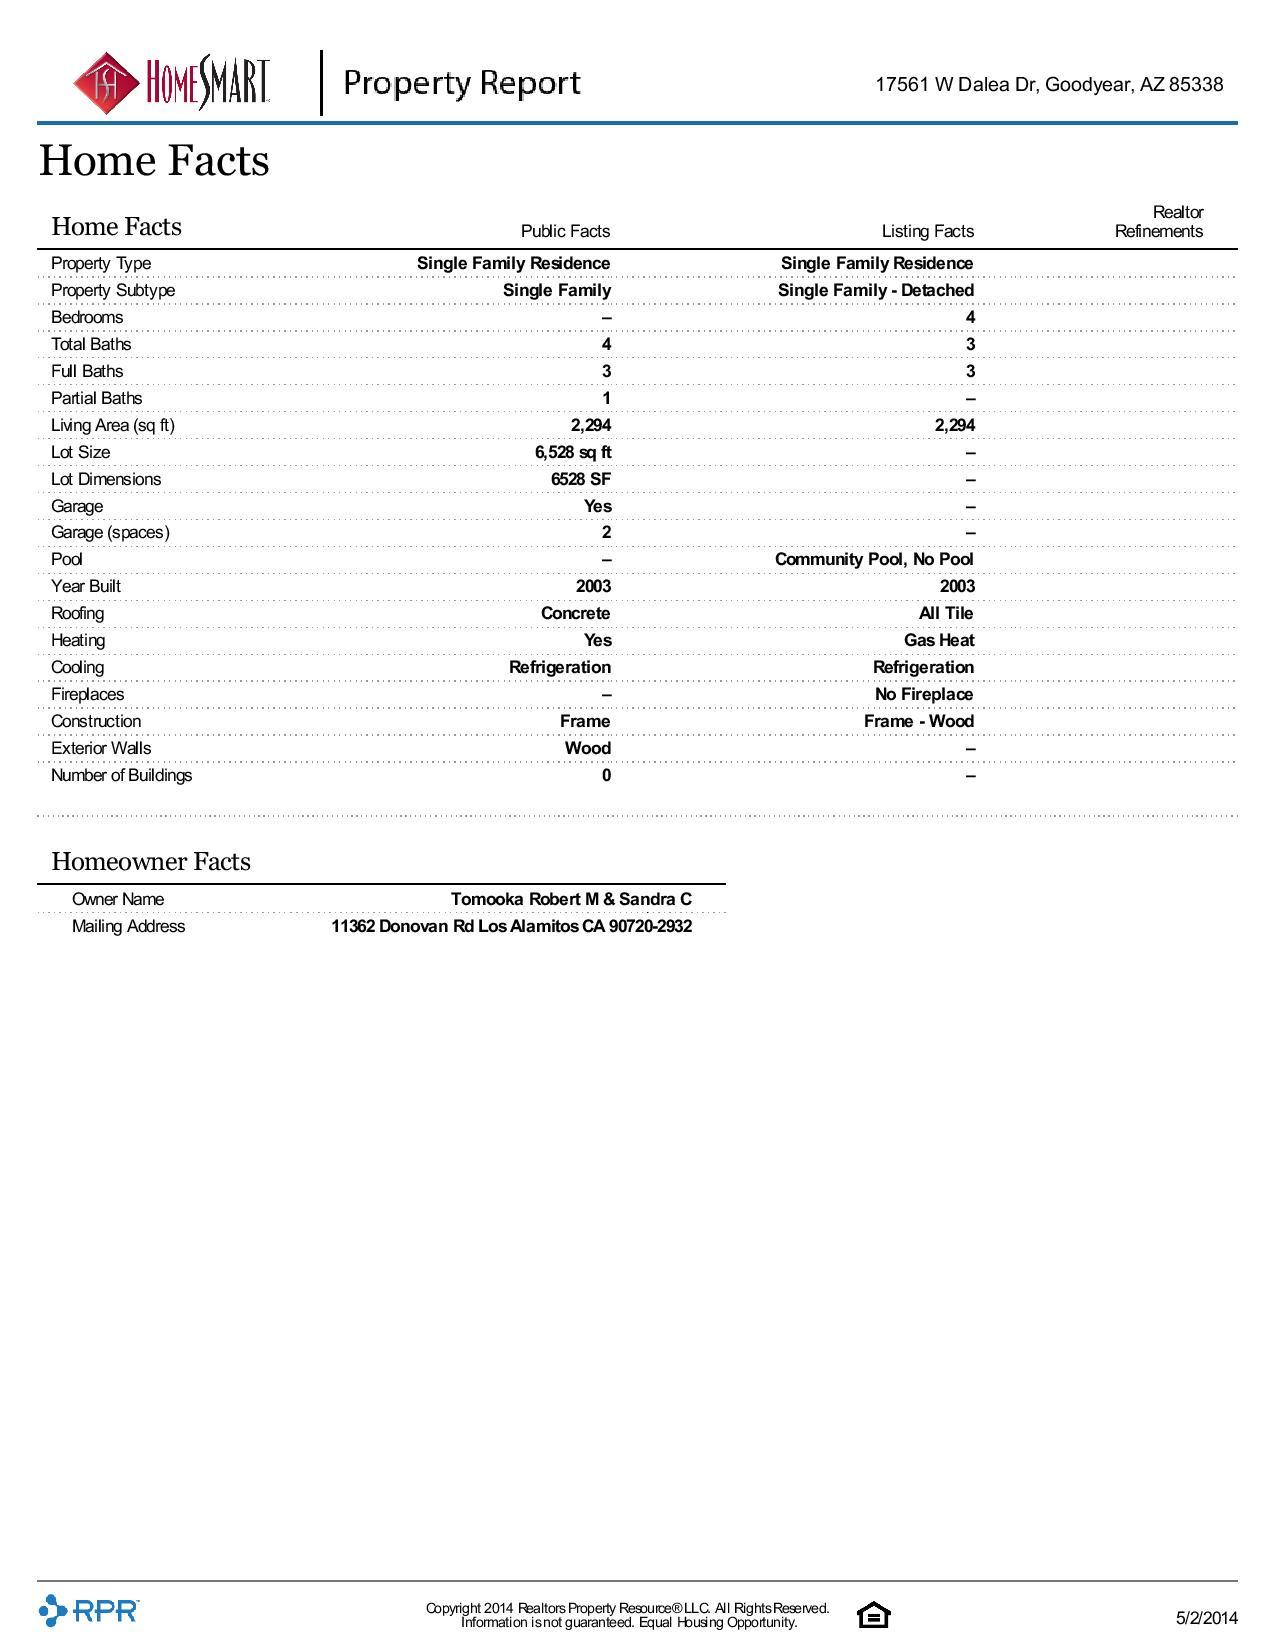 17561-W-Dalea-Dr-Goodyear-AZ-85338-page-003